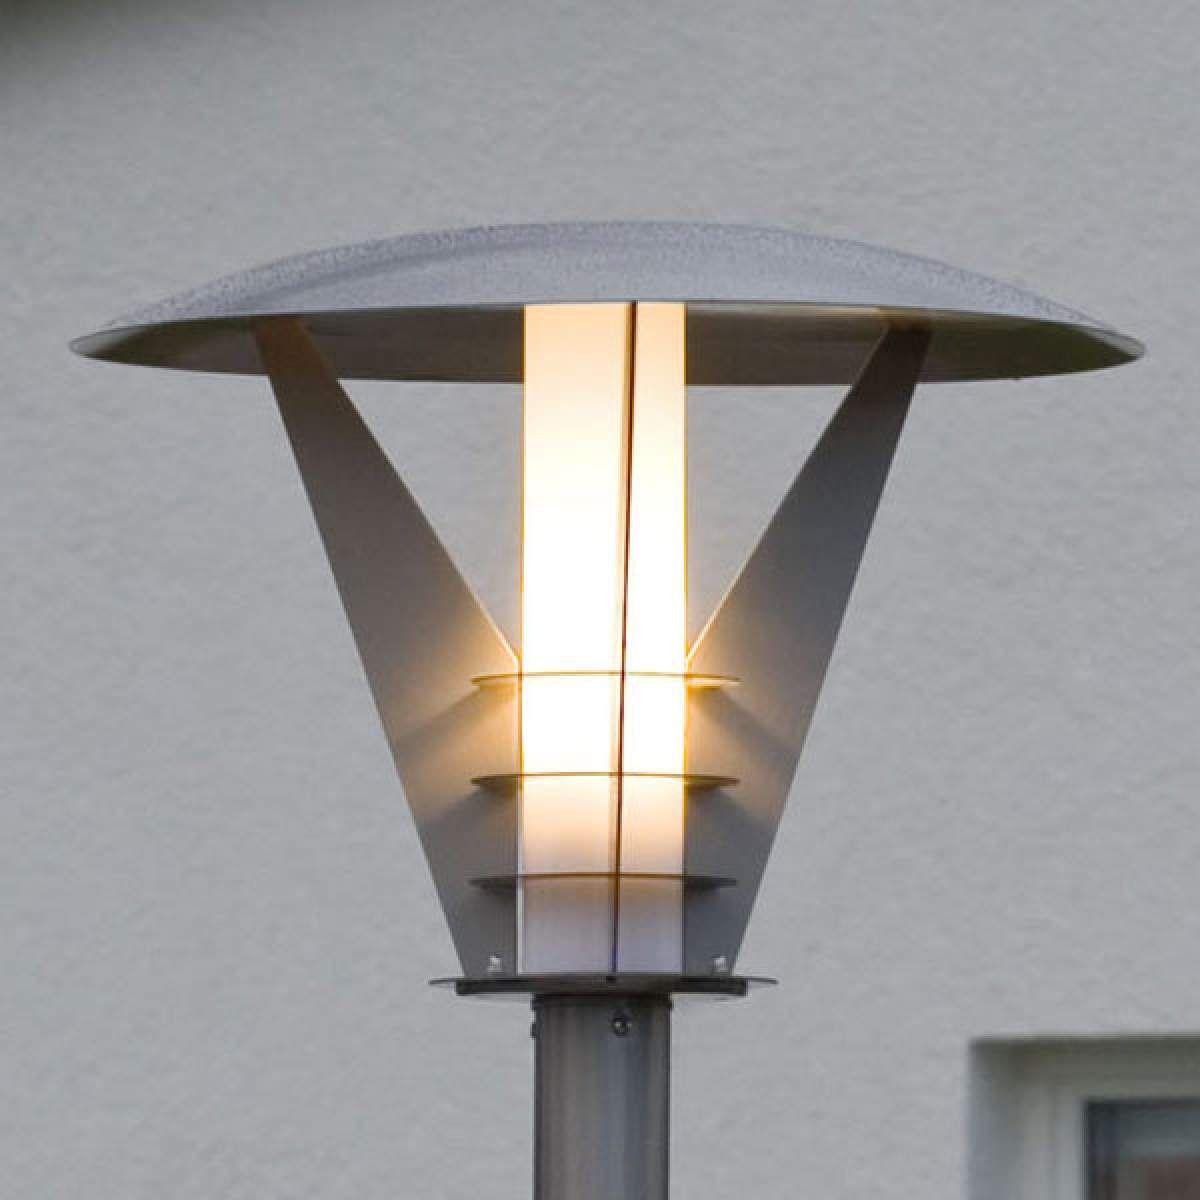 Mastleuchte Larissa Aus Edelstahl Modernes Design Von Konstmide Strassenlaterne Modernes Design Edelstahl